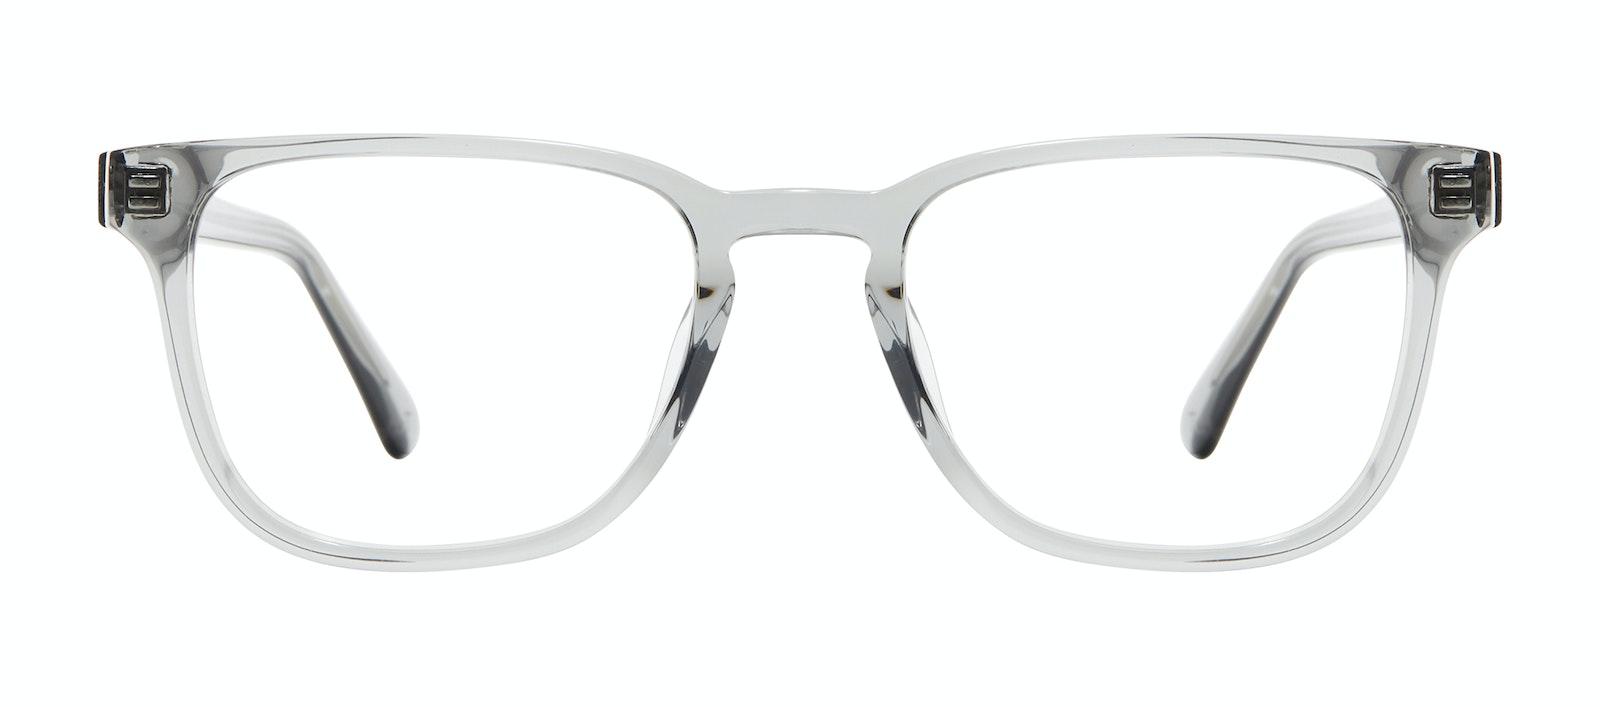 Affordable Fashion Glasses Square Eyeglasses Men Kim Storm Front